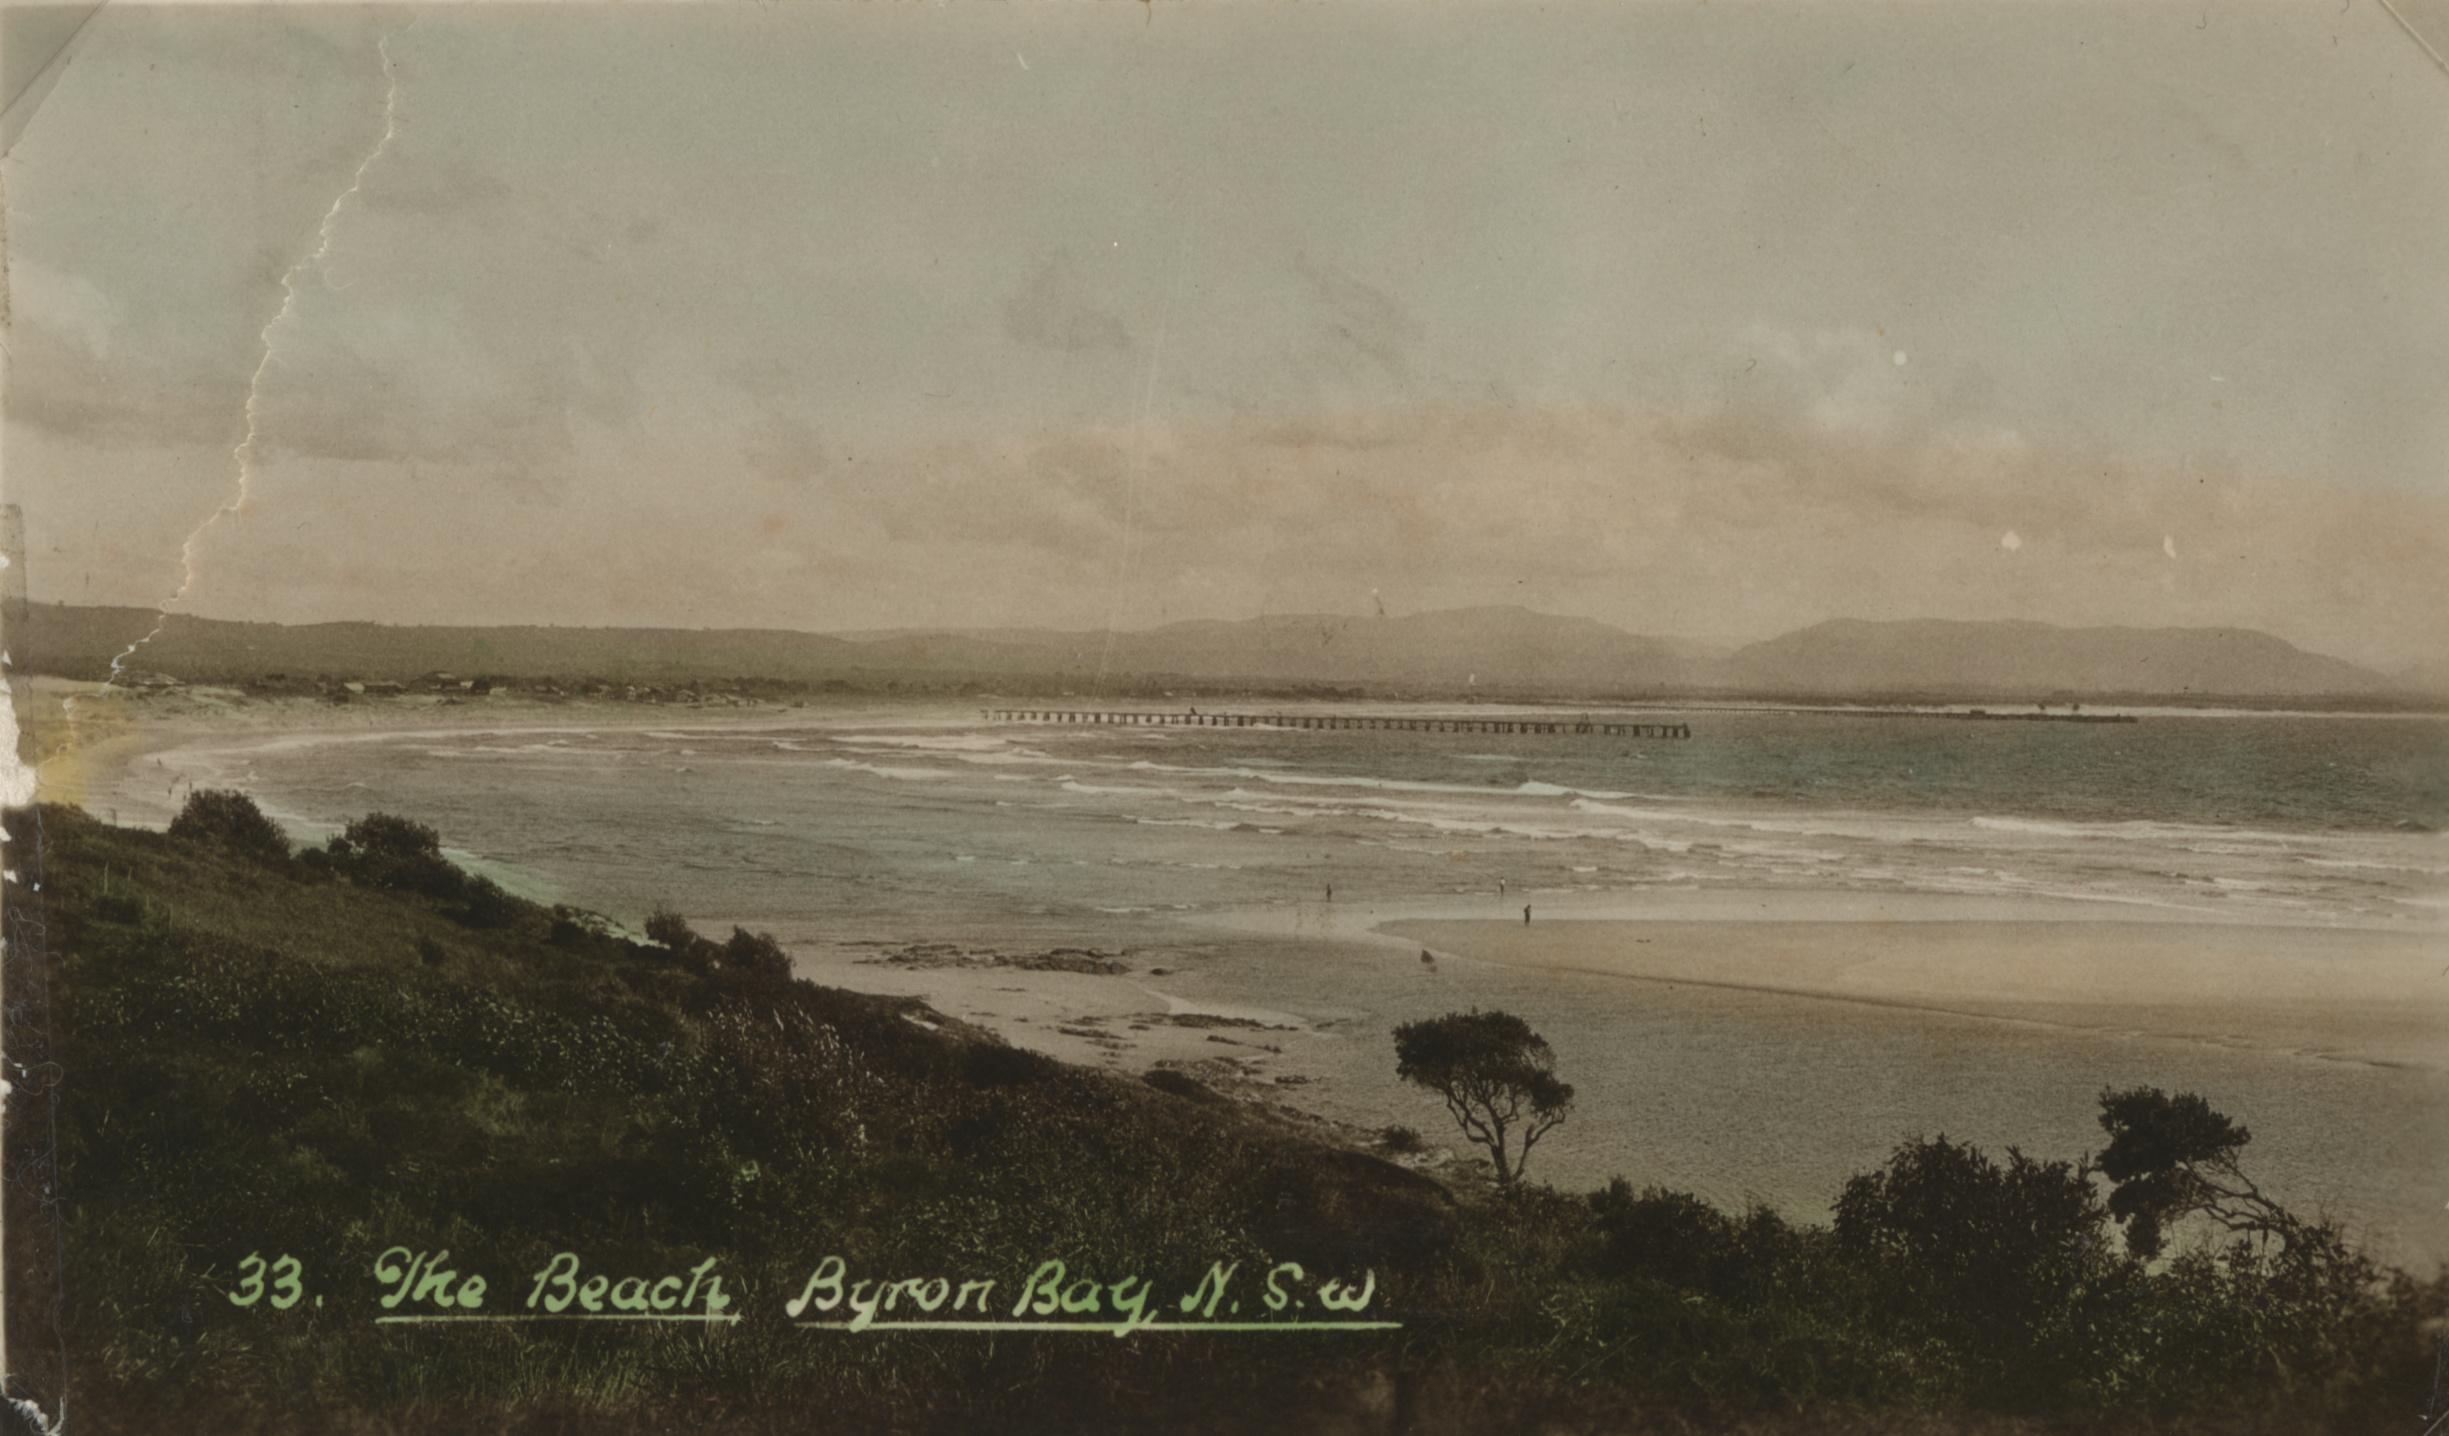 rtrl-beaches080-tif